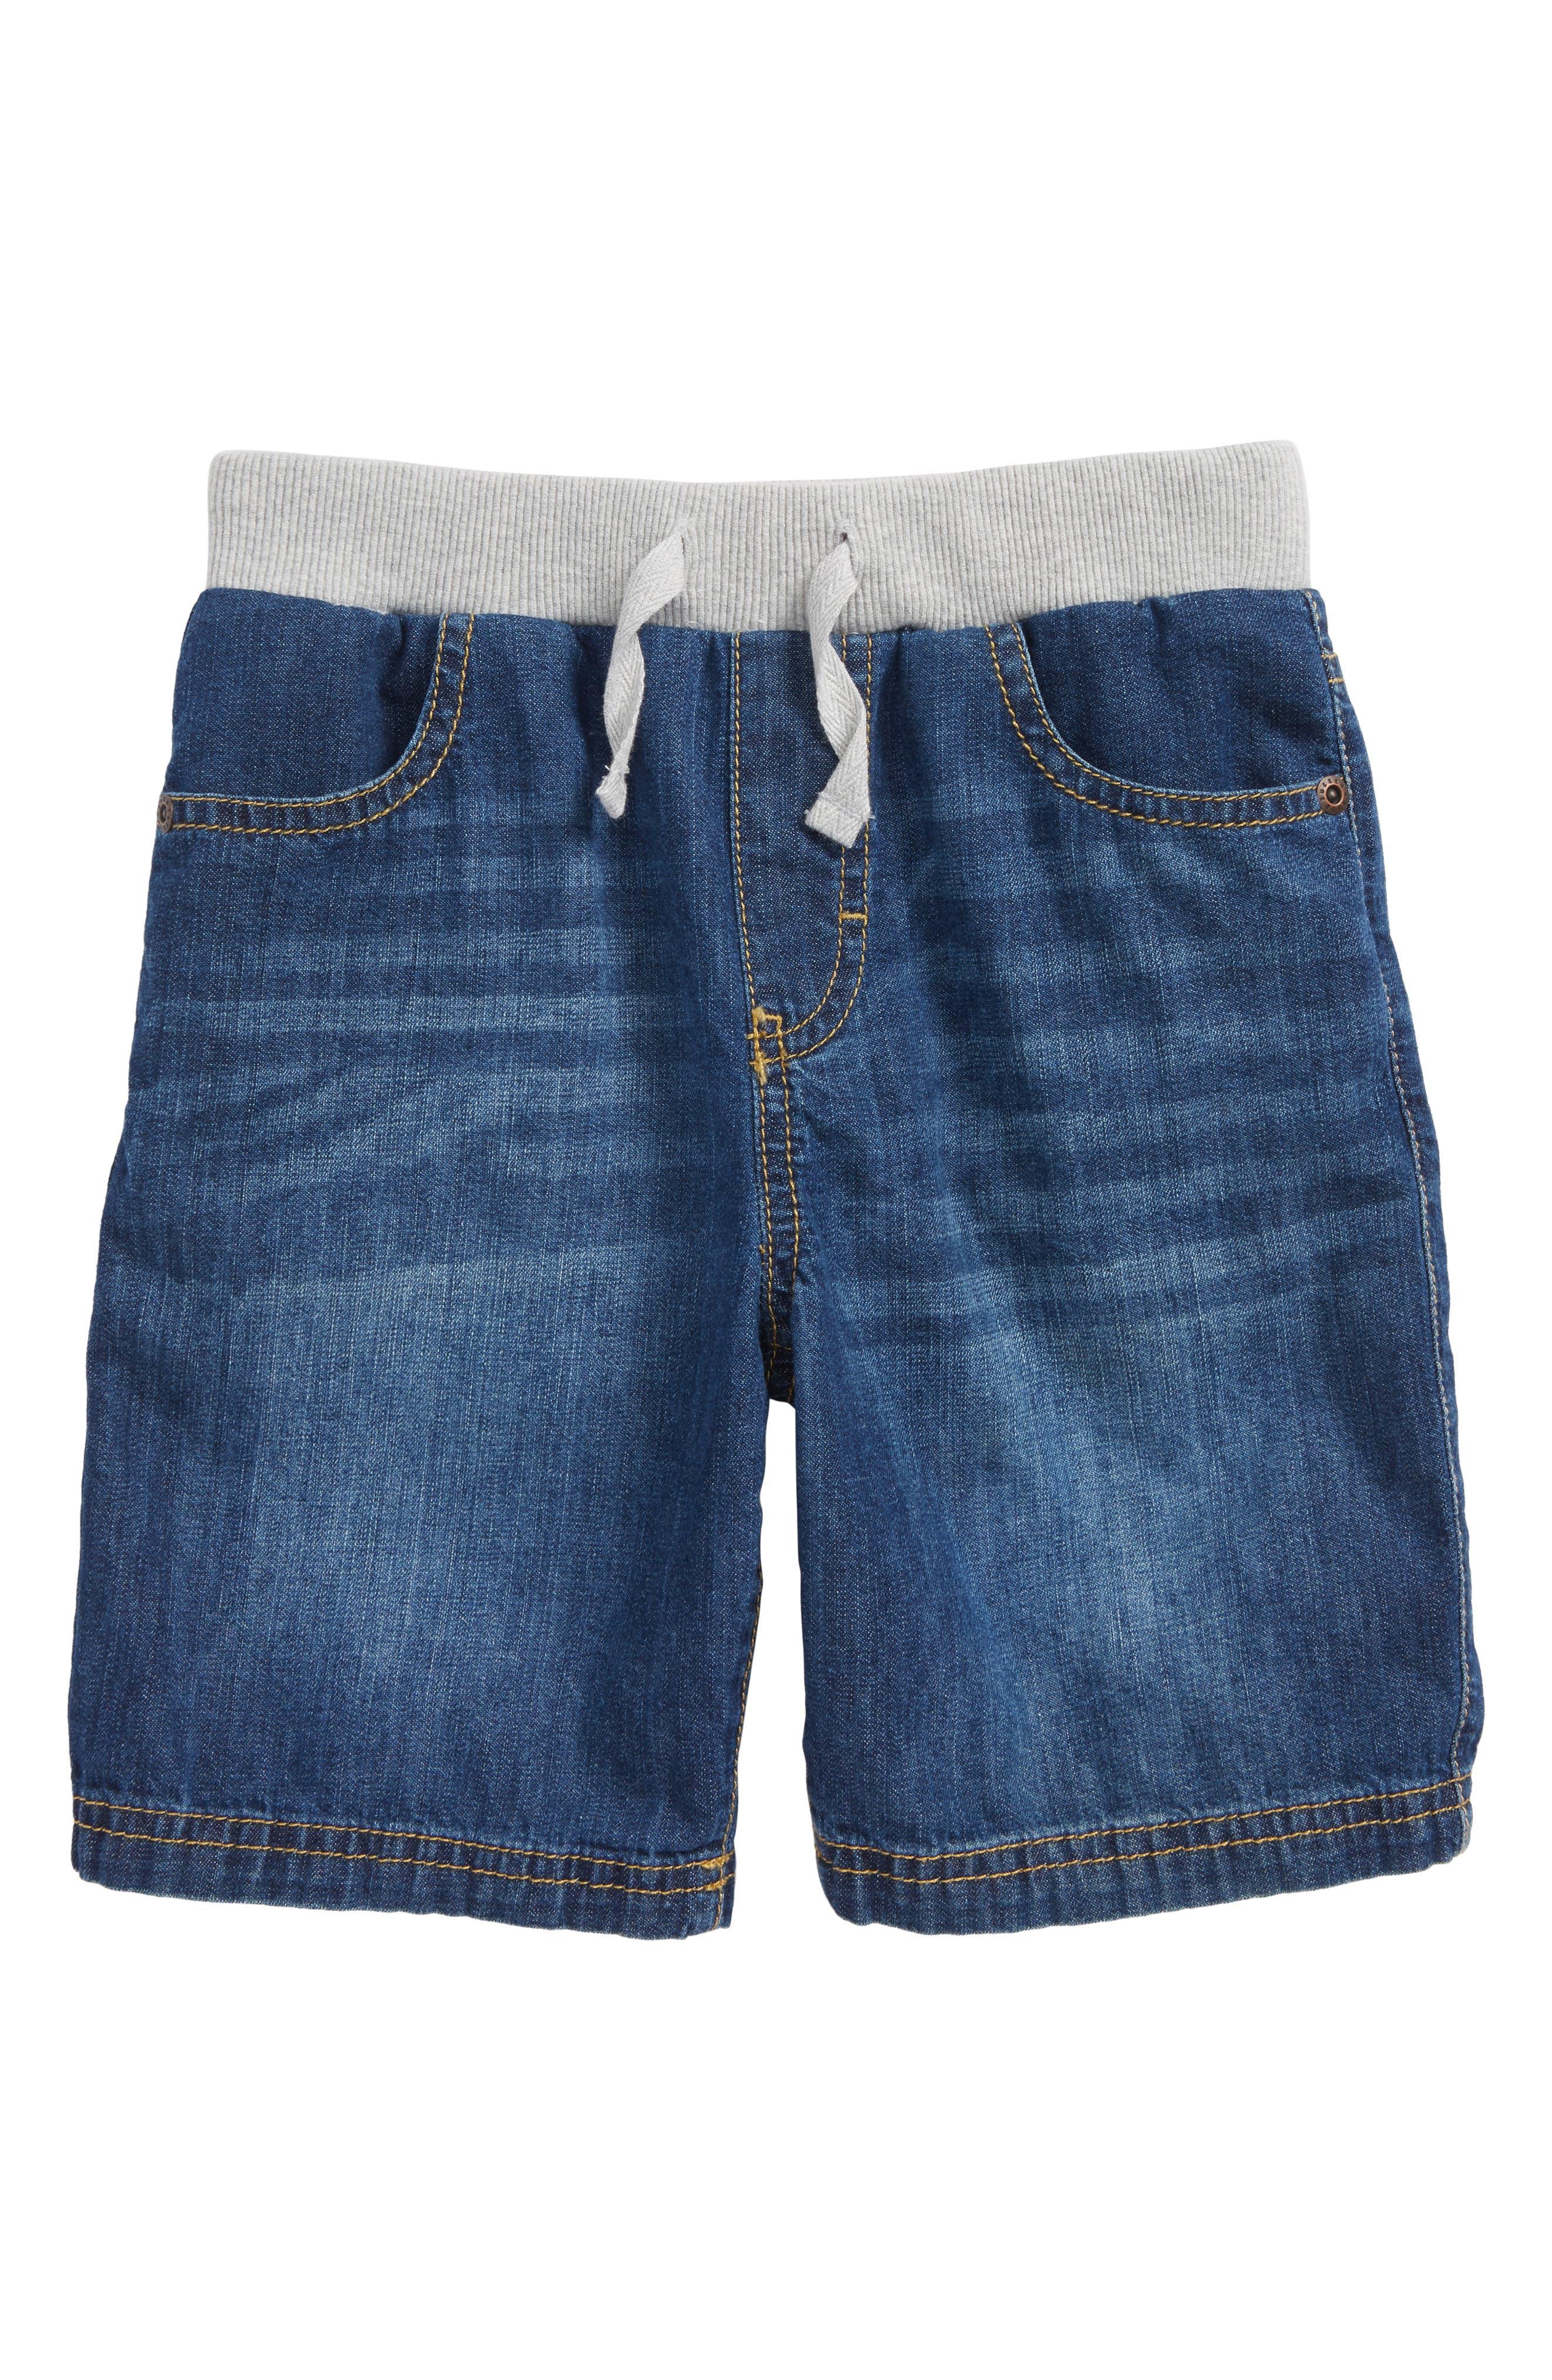 Denim Shorts,                             Main thumbnail 1, color,